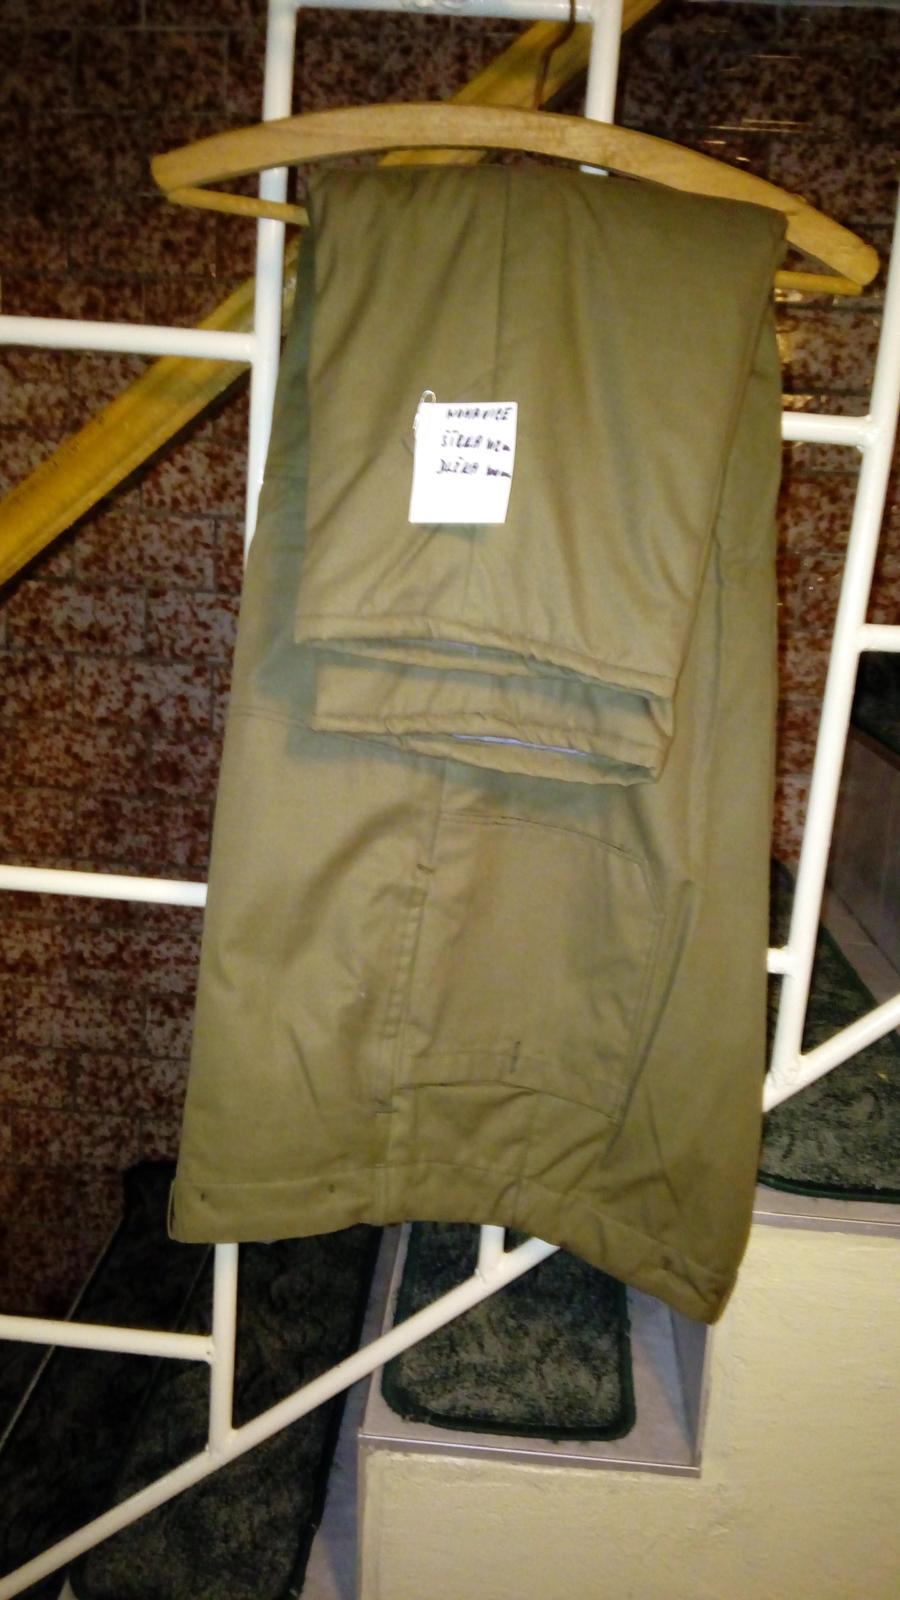 pracovne oblecenie nohavice presivane zateplene - Obrázok č. 1